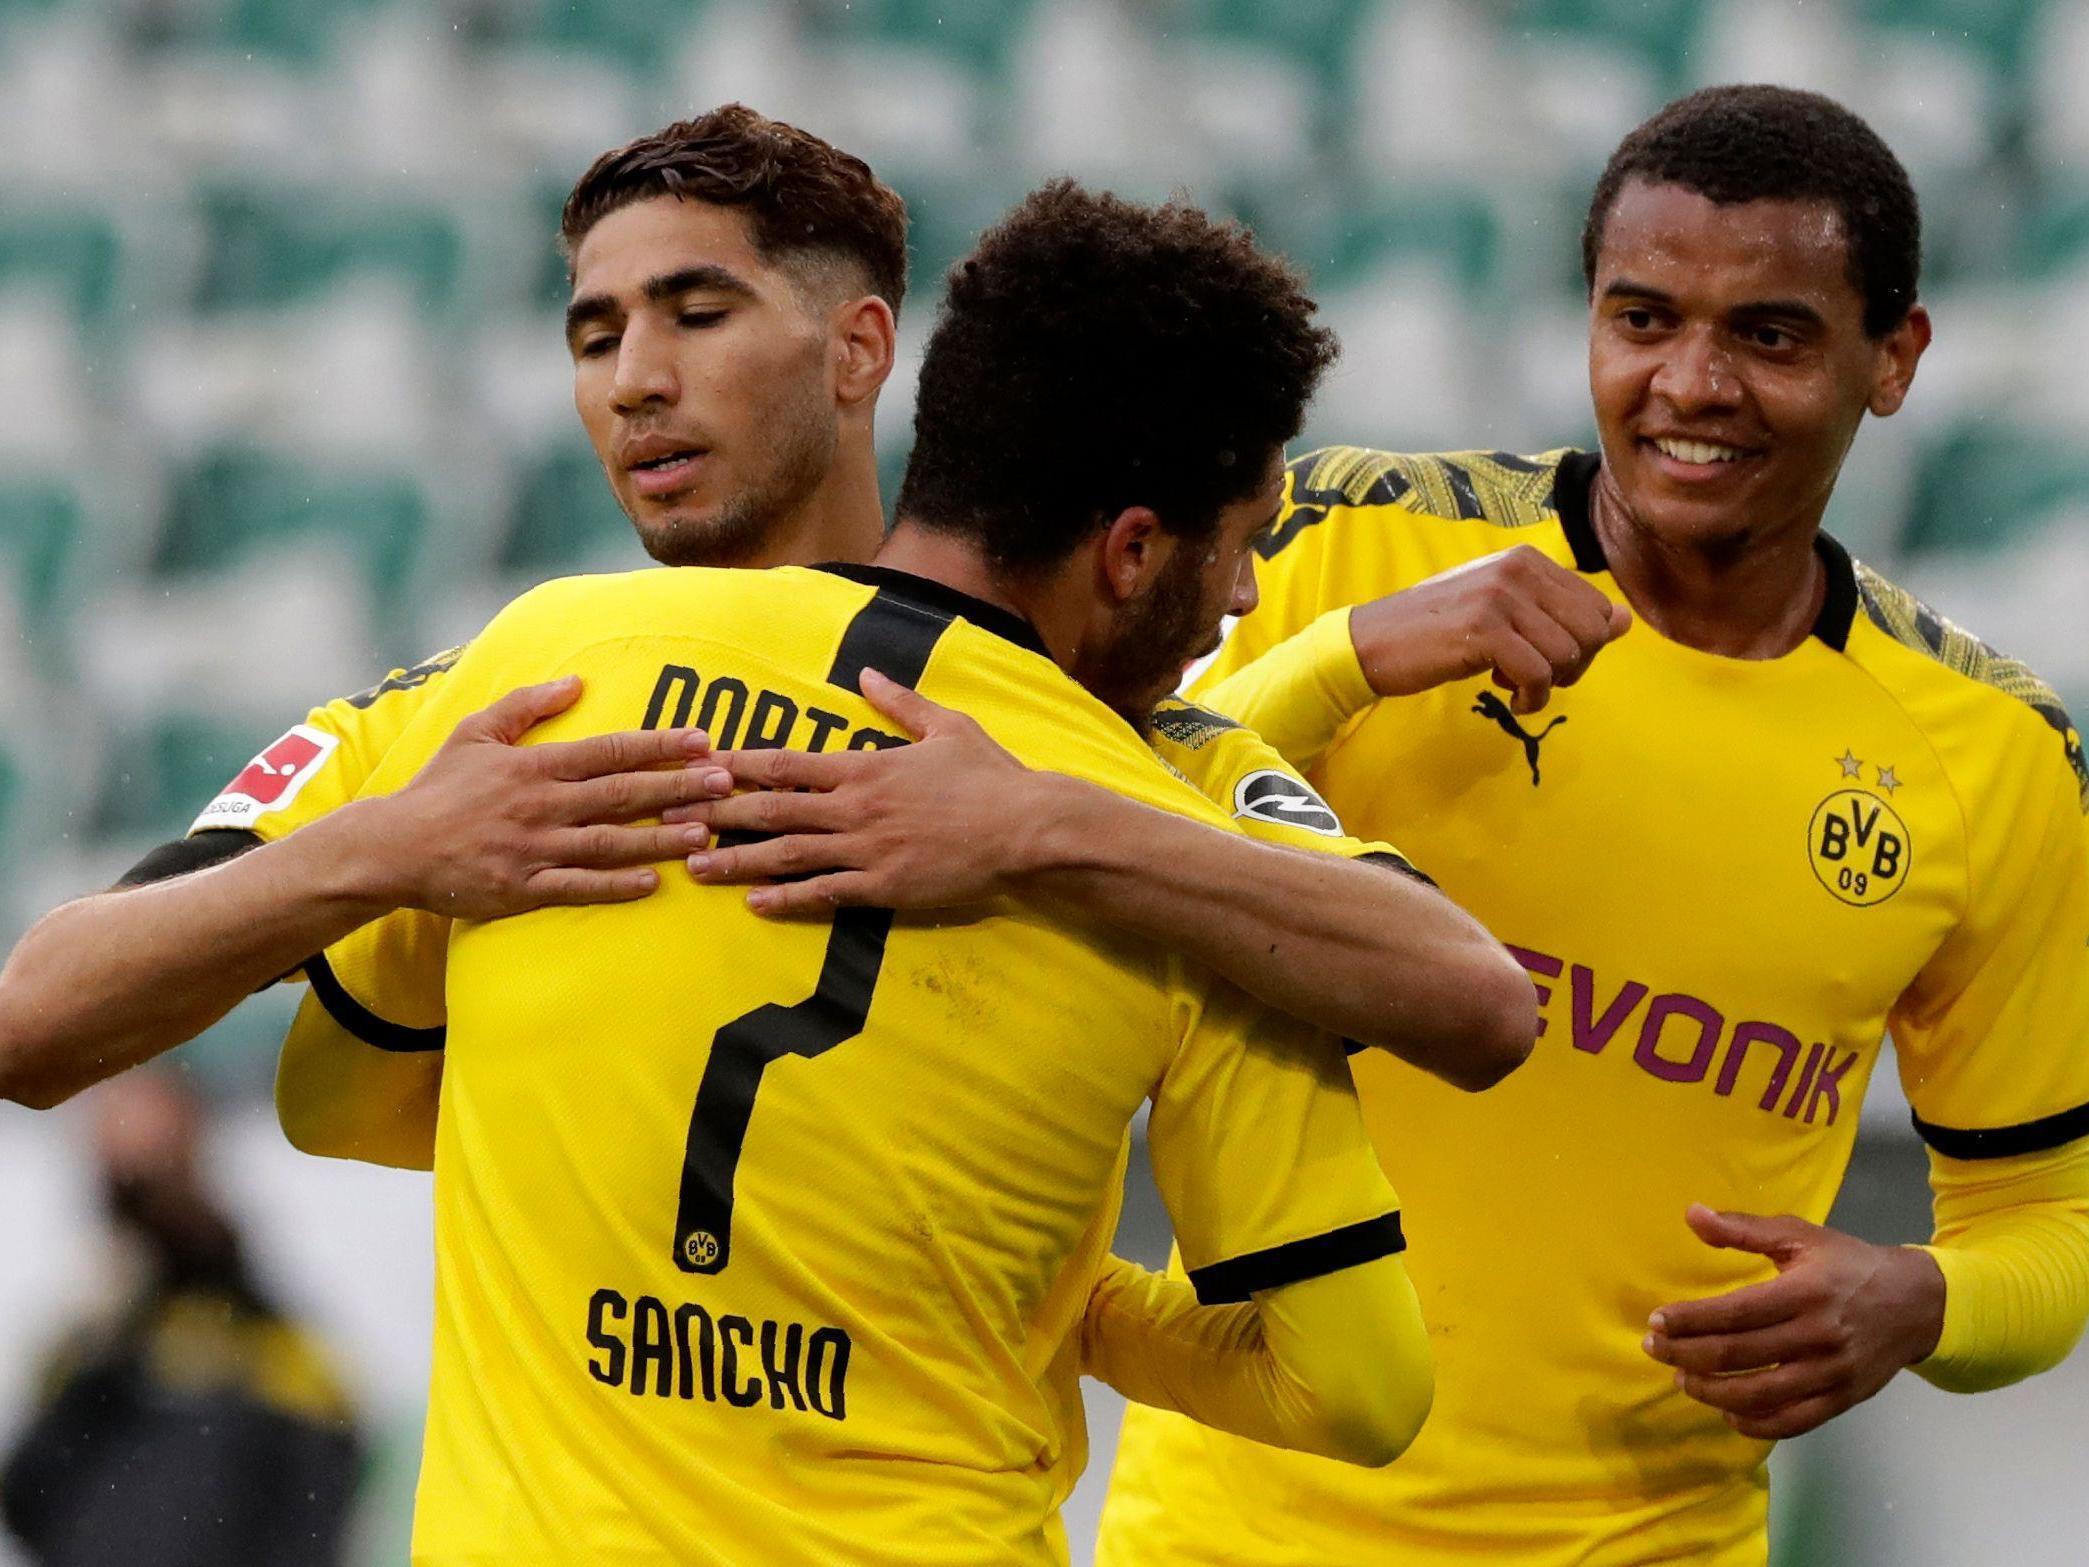 Borussia Dortmund vs Bayern Munich prediction: How will Bundesliga fixture play out today?